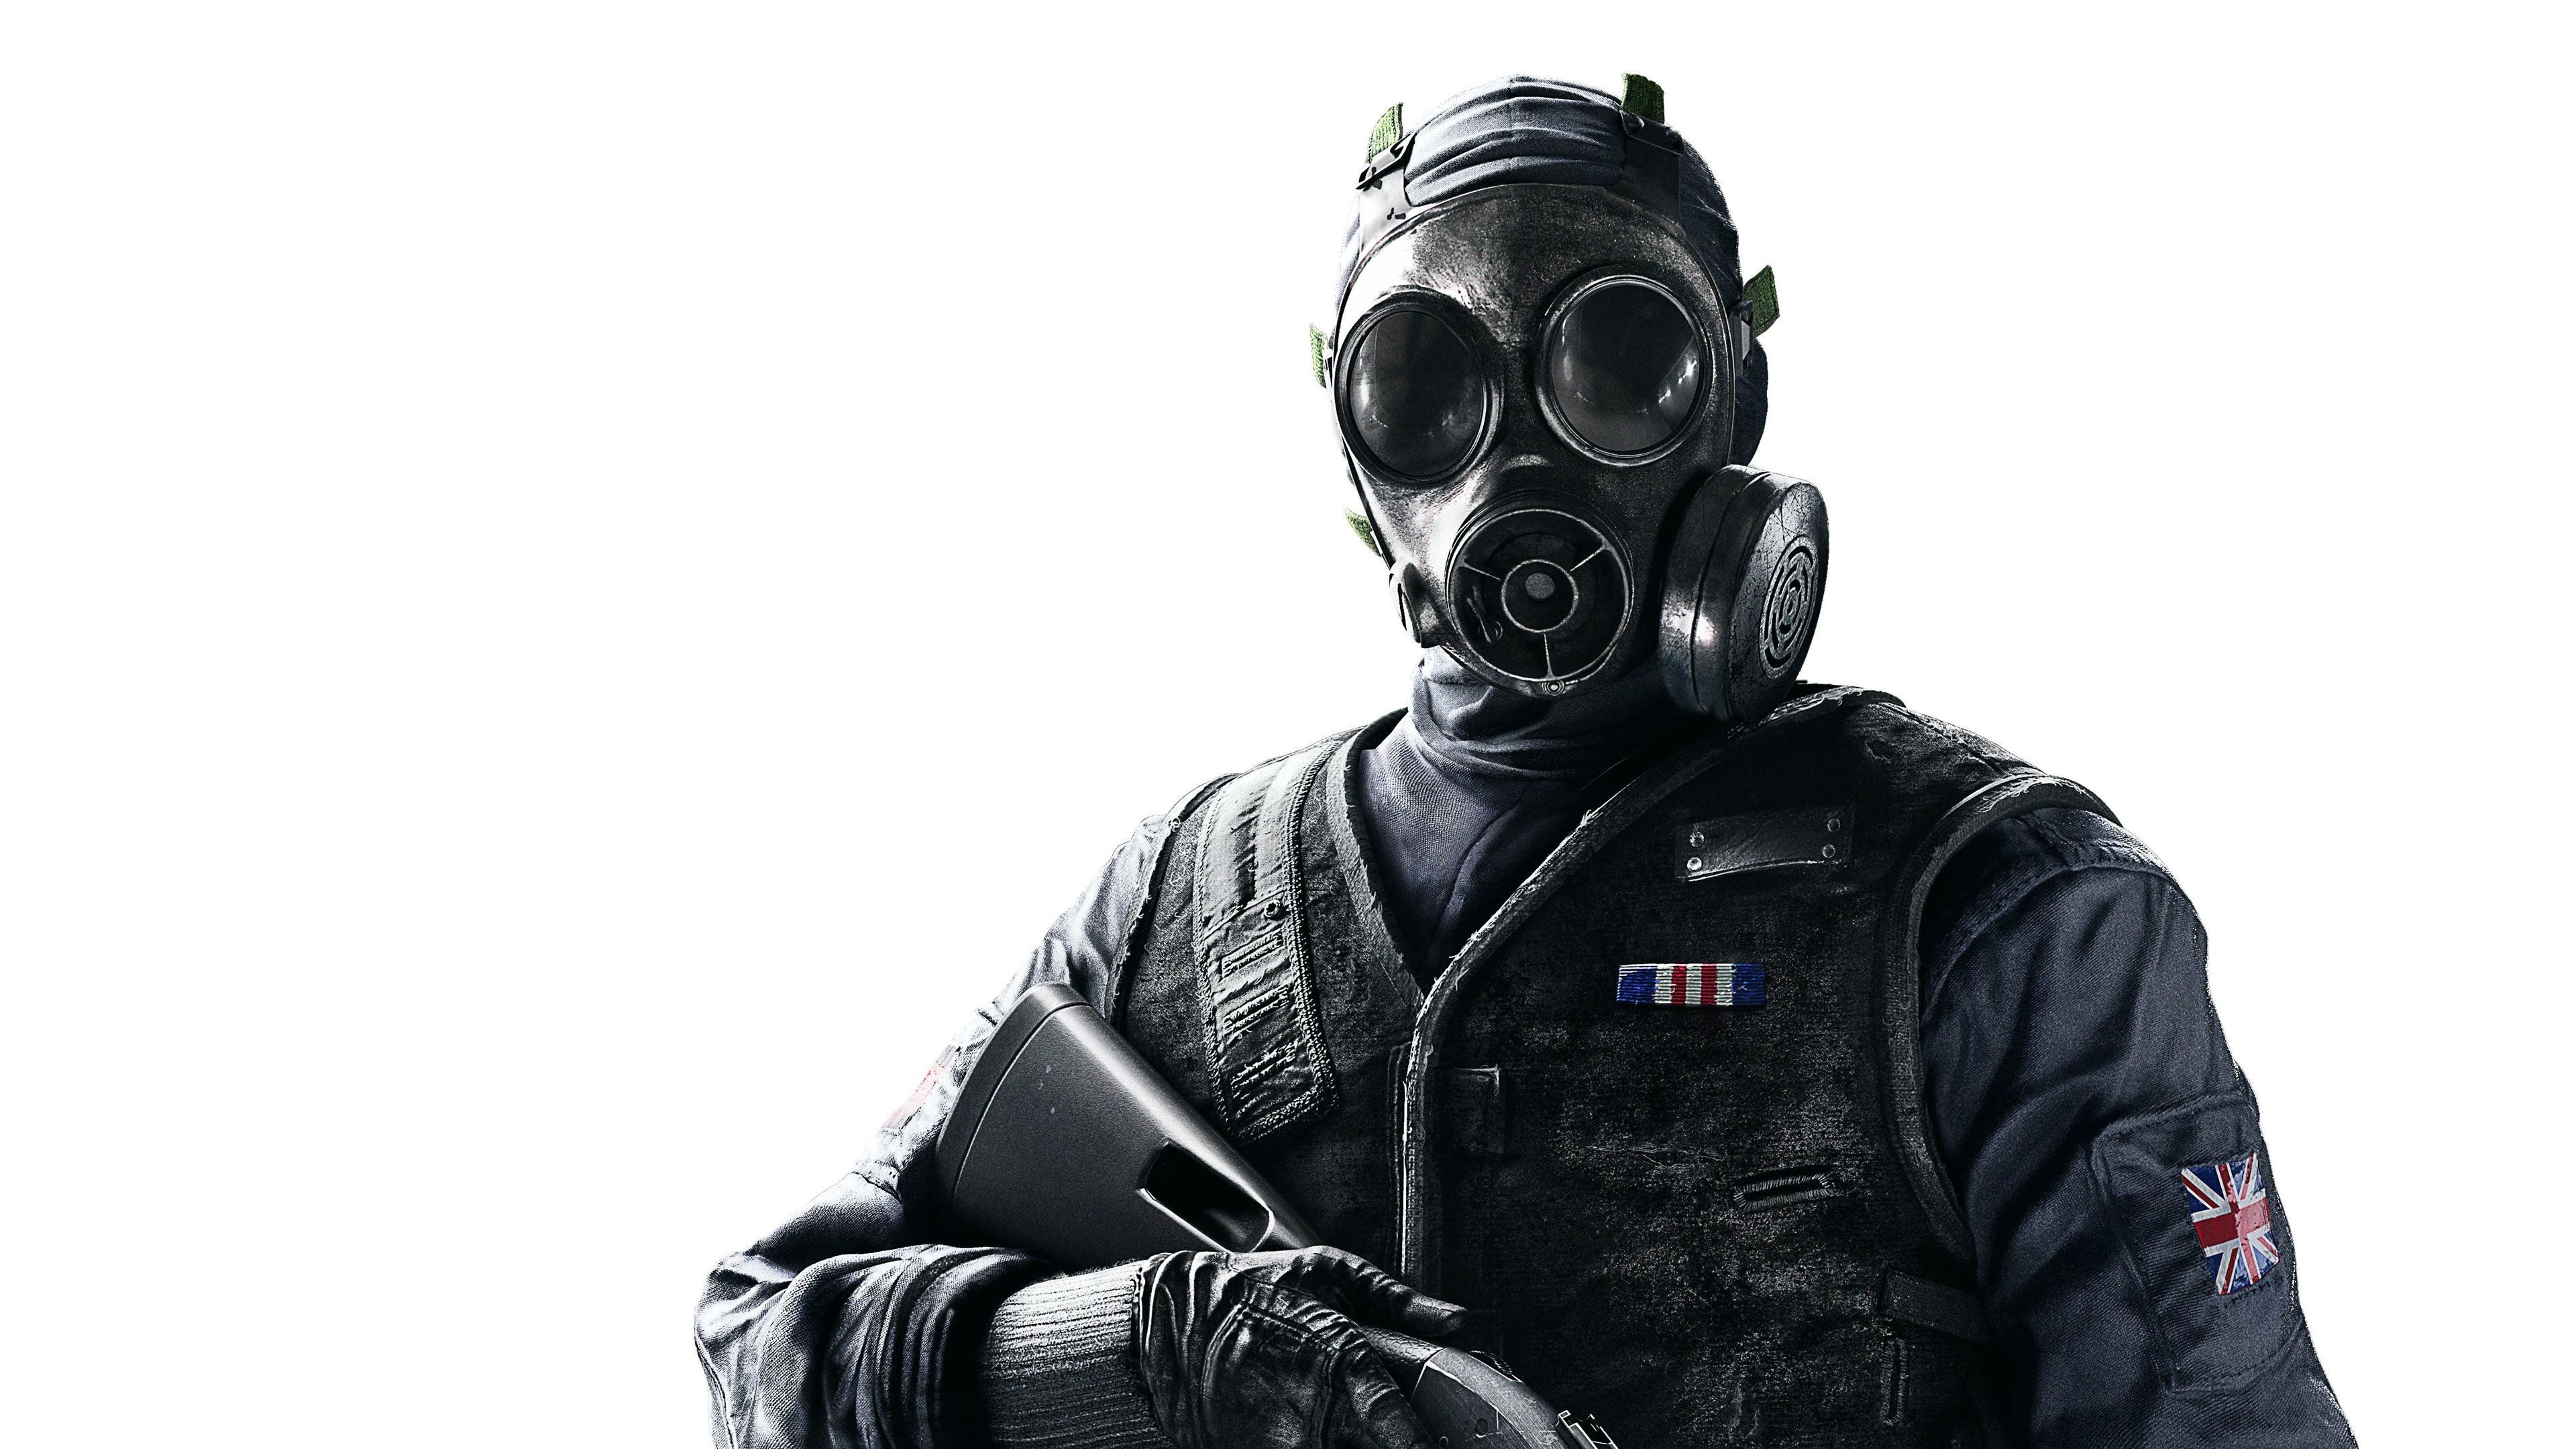 Wallpaper Rainbow Six Siege Soldier Gas Mask 3840x2160 Uhd